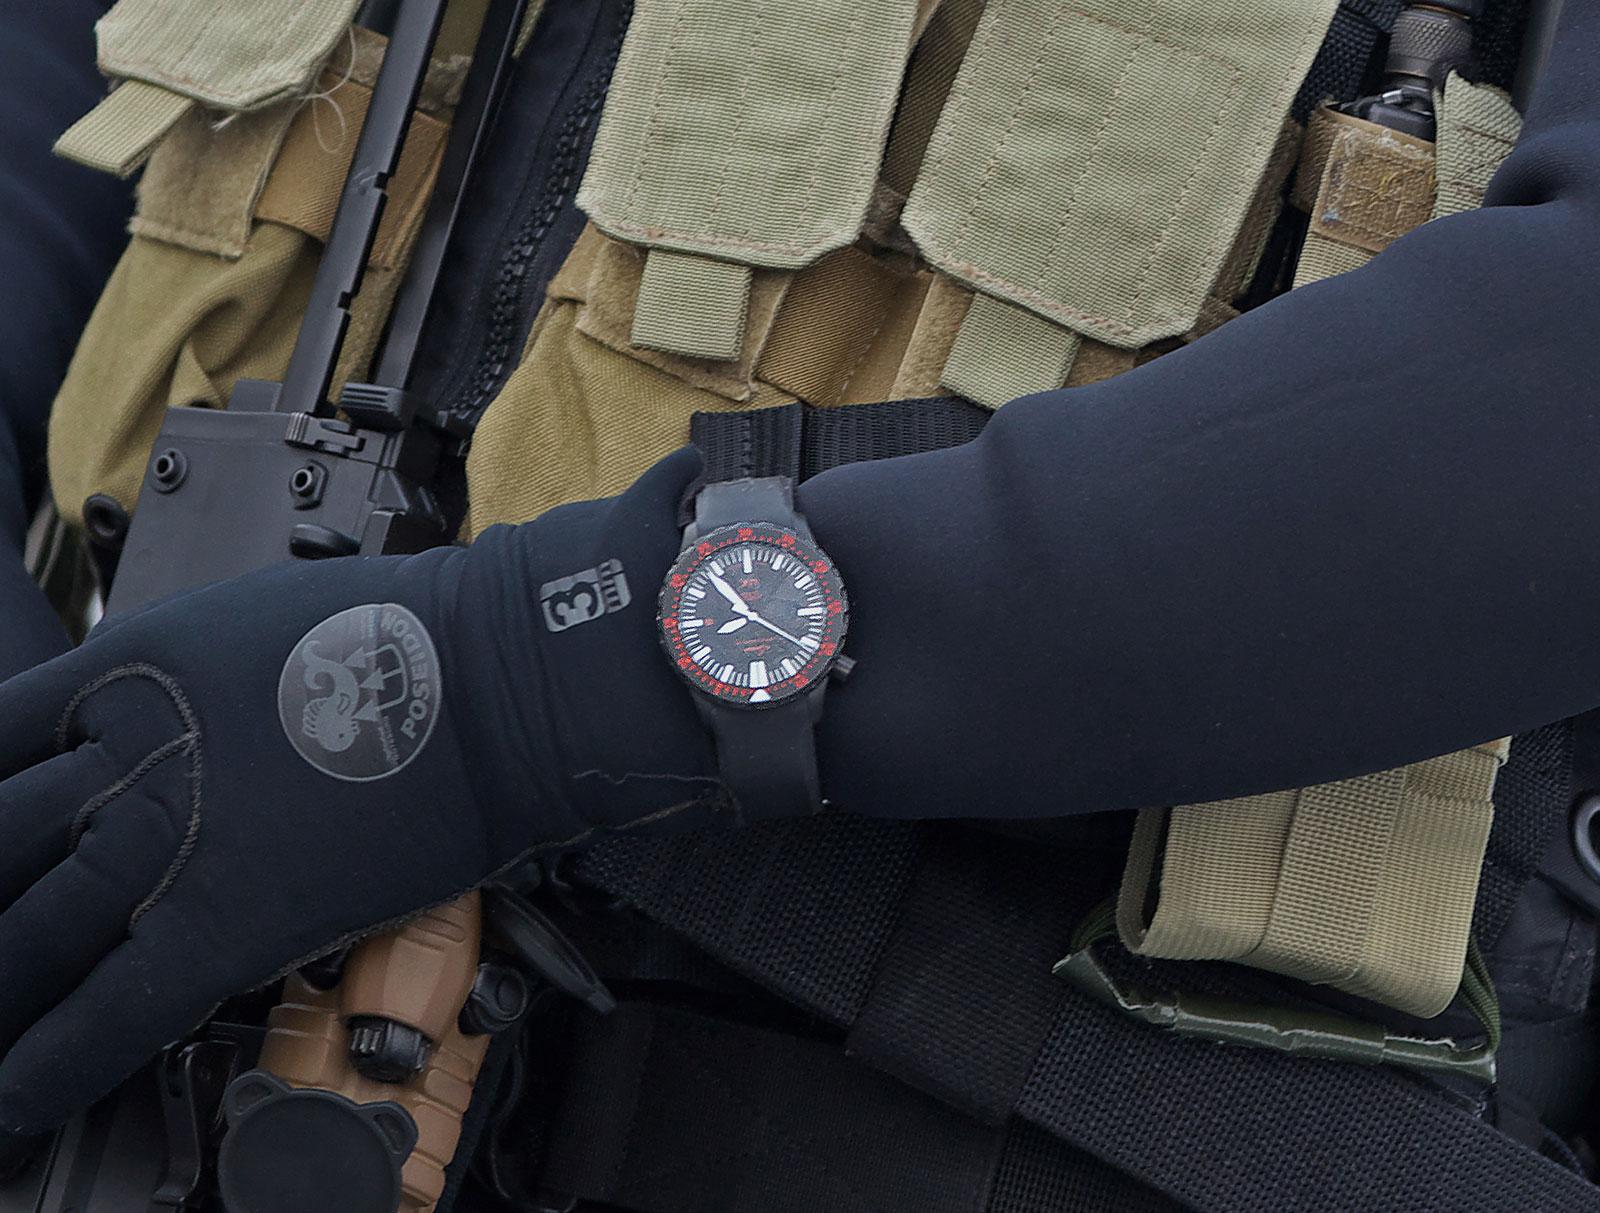 Sinn Ux S Diver Is Now Official Wristwatch Of German Navy